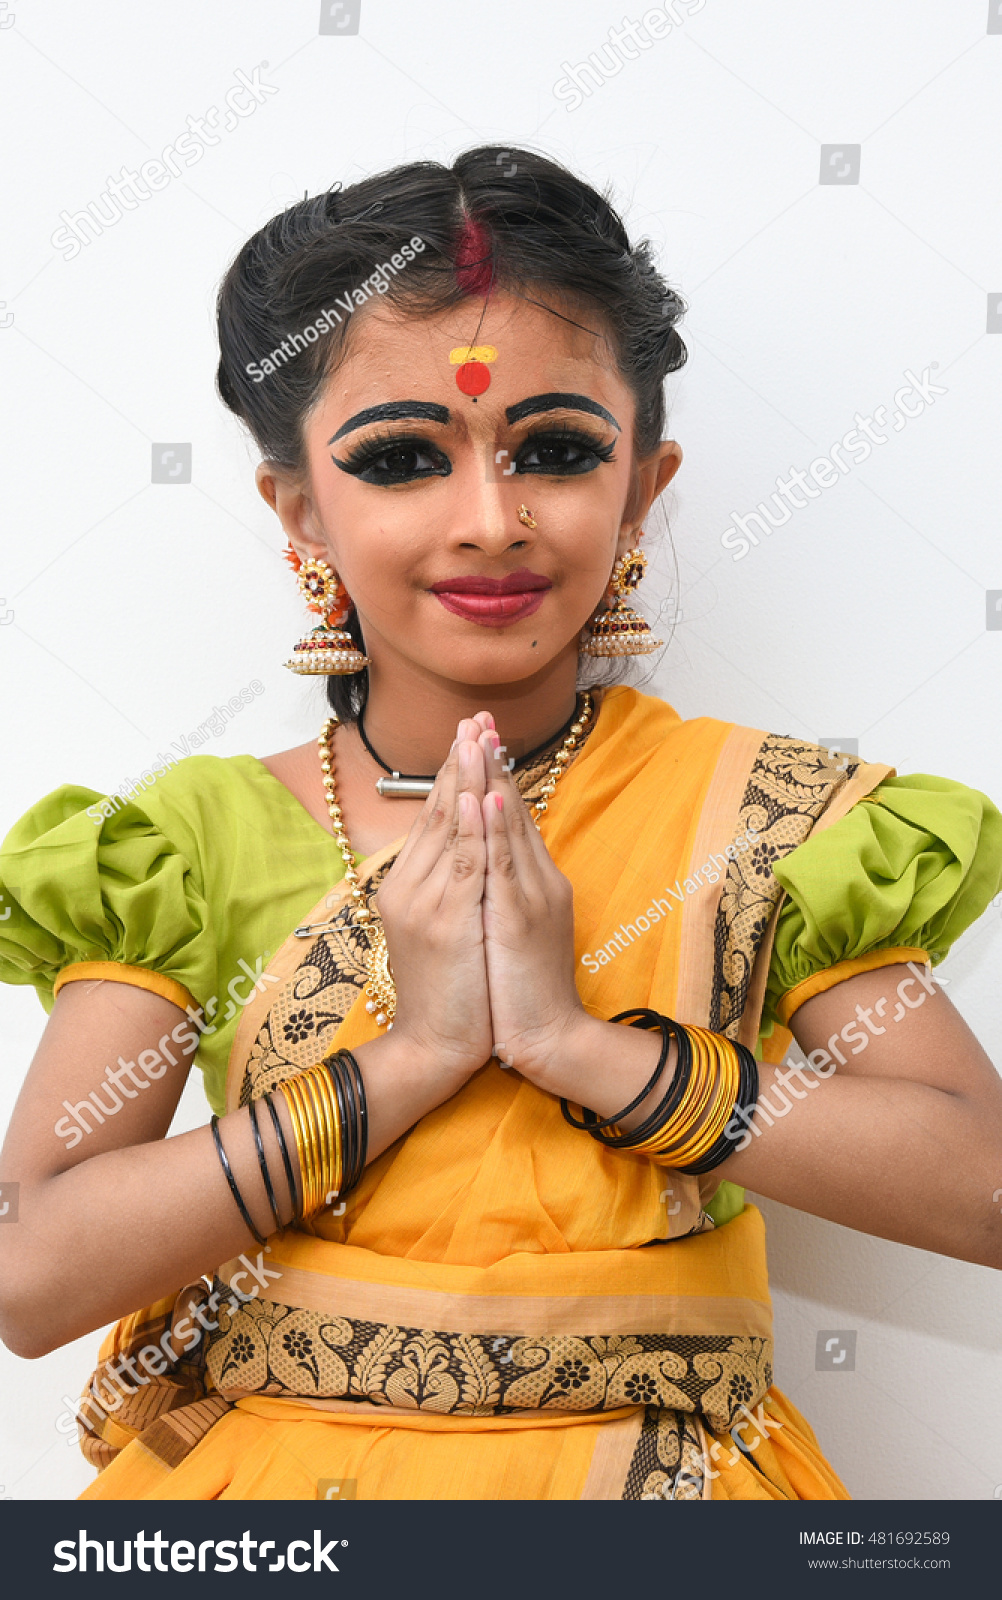 Royalty Free Beautiful Young Indian Girlwomenkid 481692589 Stock